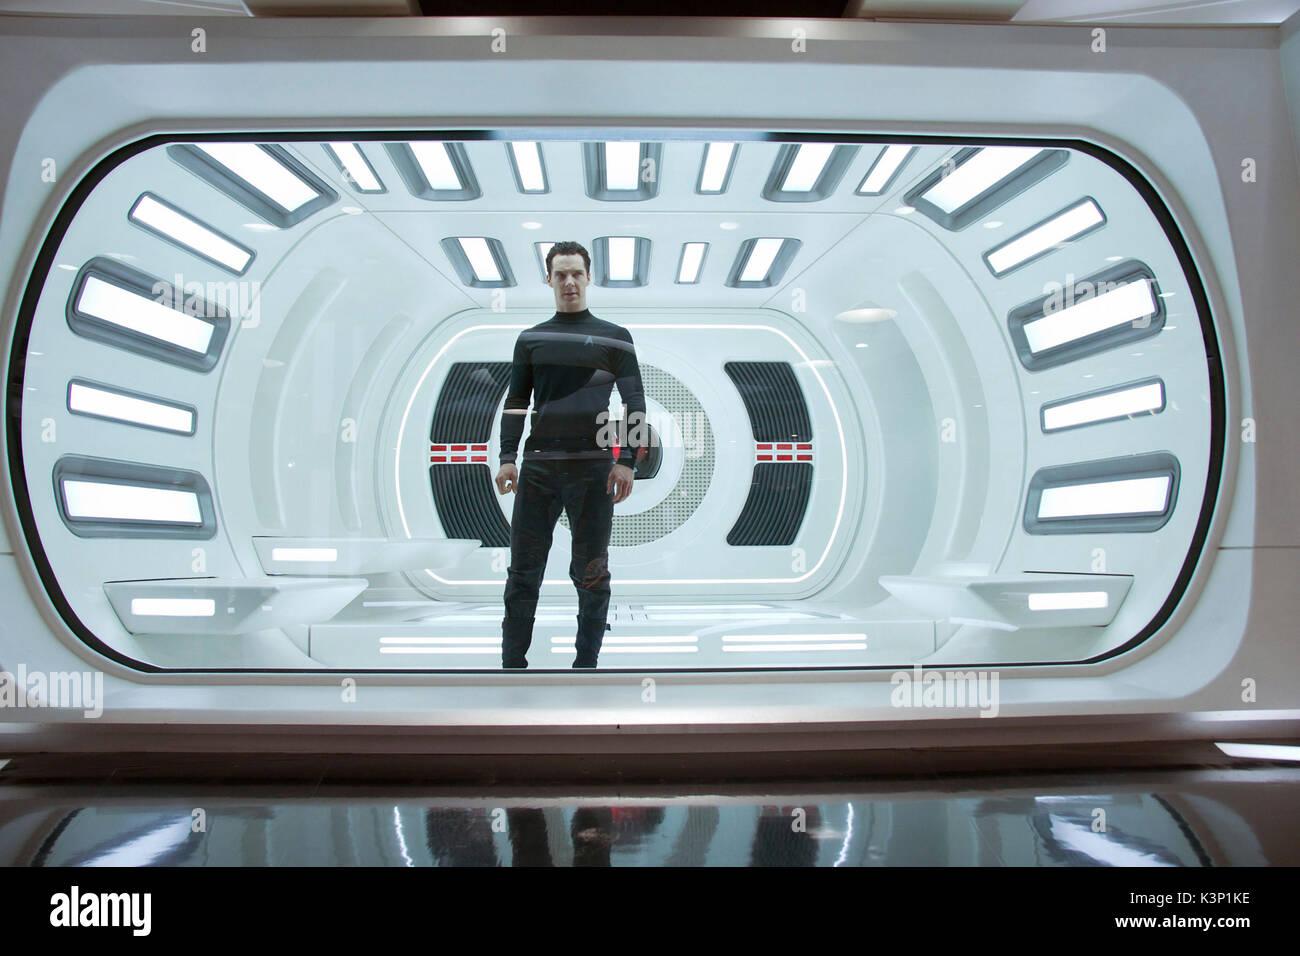 STAR TREK INTO DARKNESS [US 2013] BENEDICT CUMBERBATCH as John Harrison     Date: 2013 - Stock Image